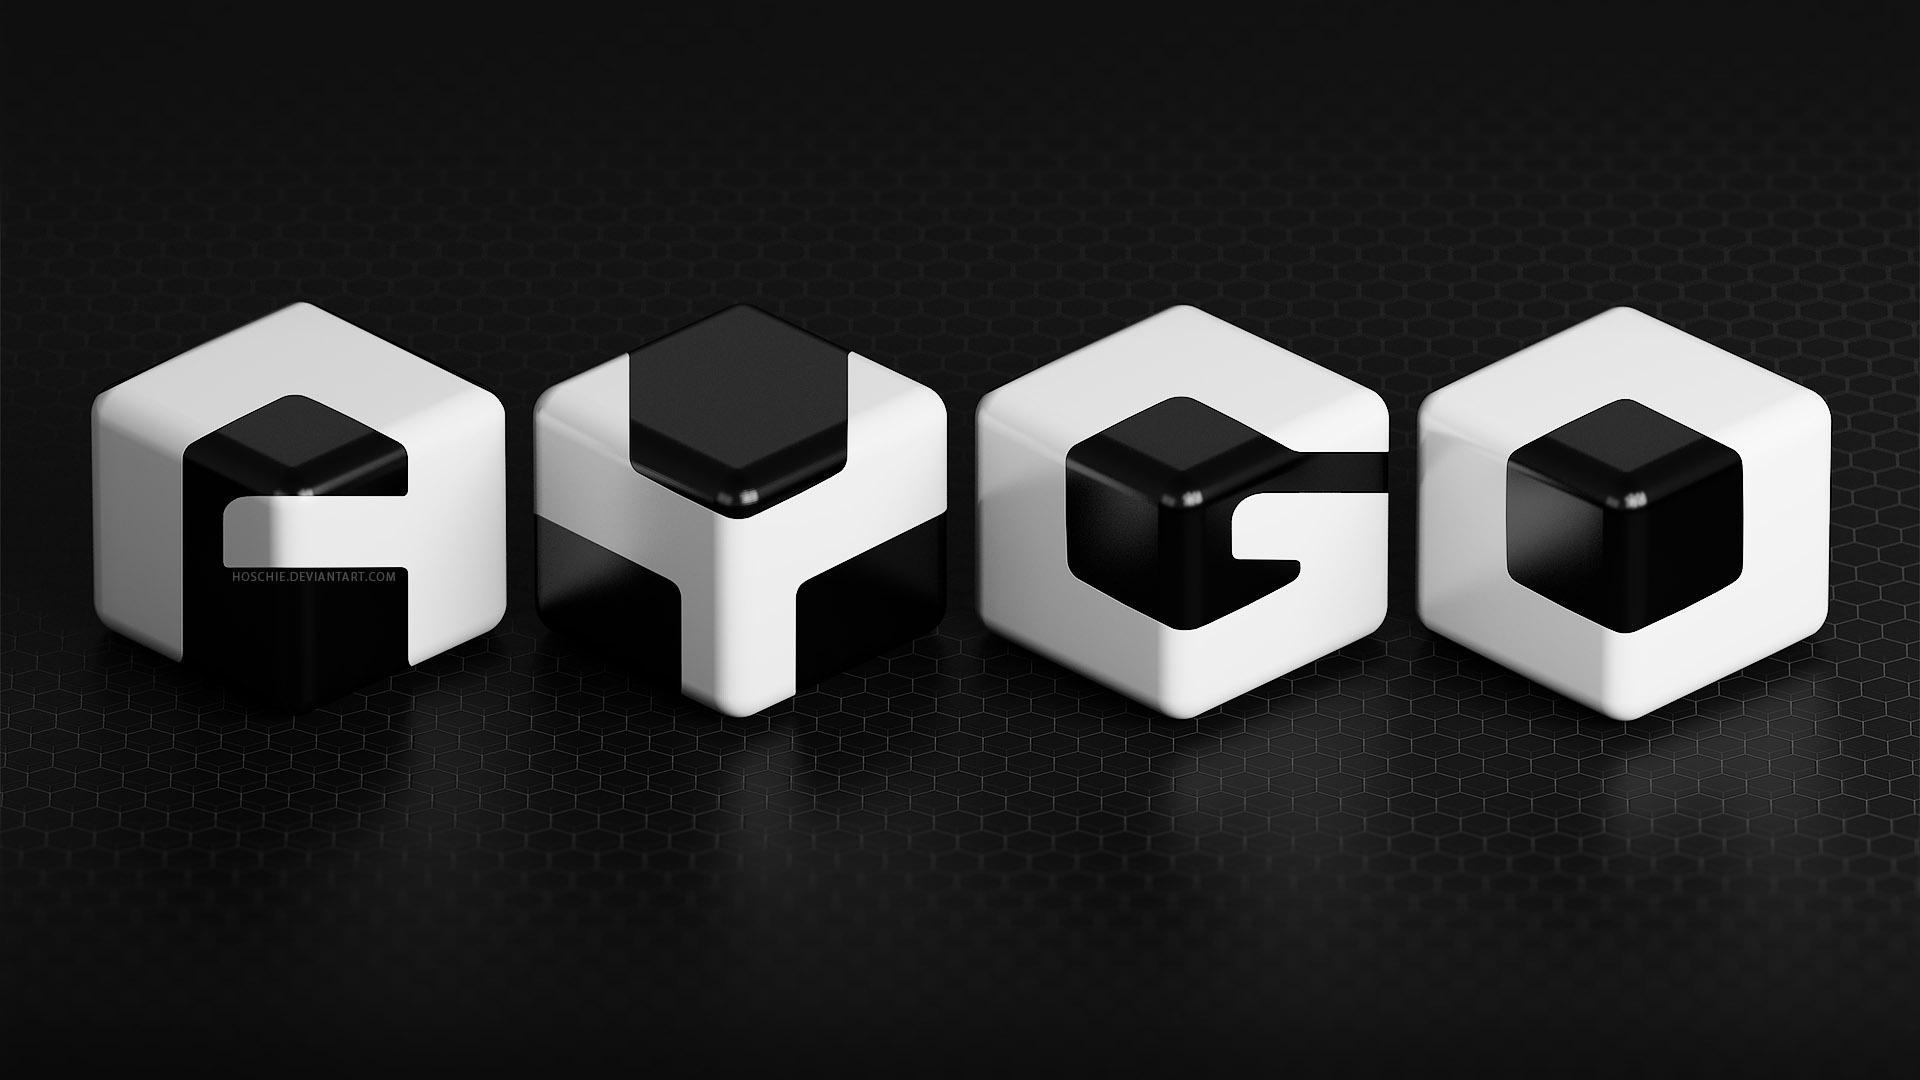 AYGO 3D wallpaper 1 by hoschie 1920x1080